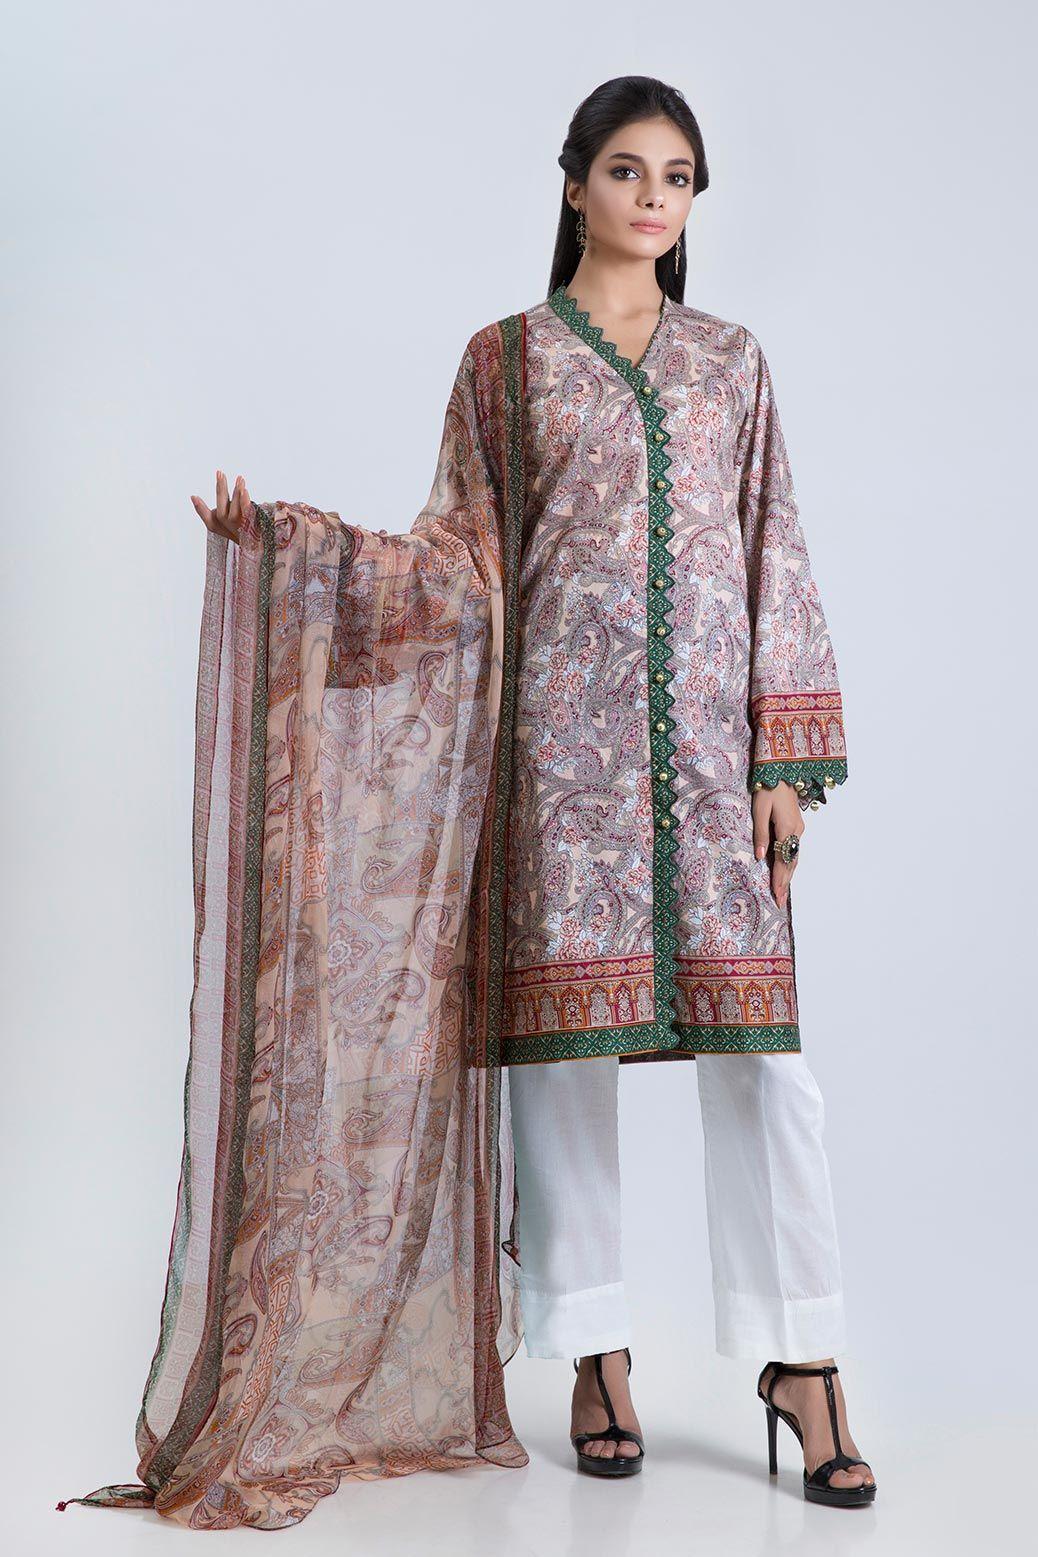 Bonanza Satrangi latest Eid Collection width=